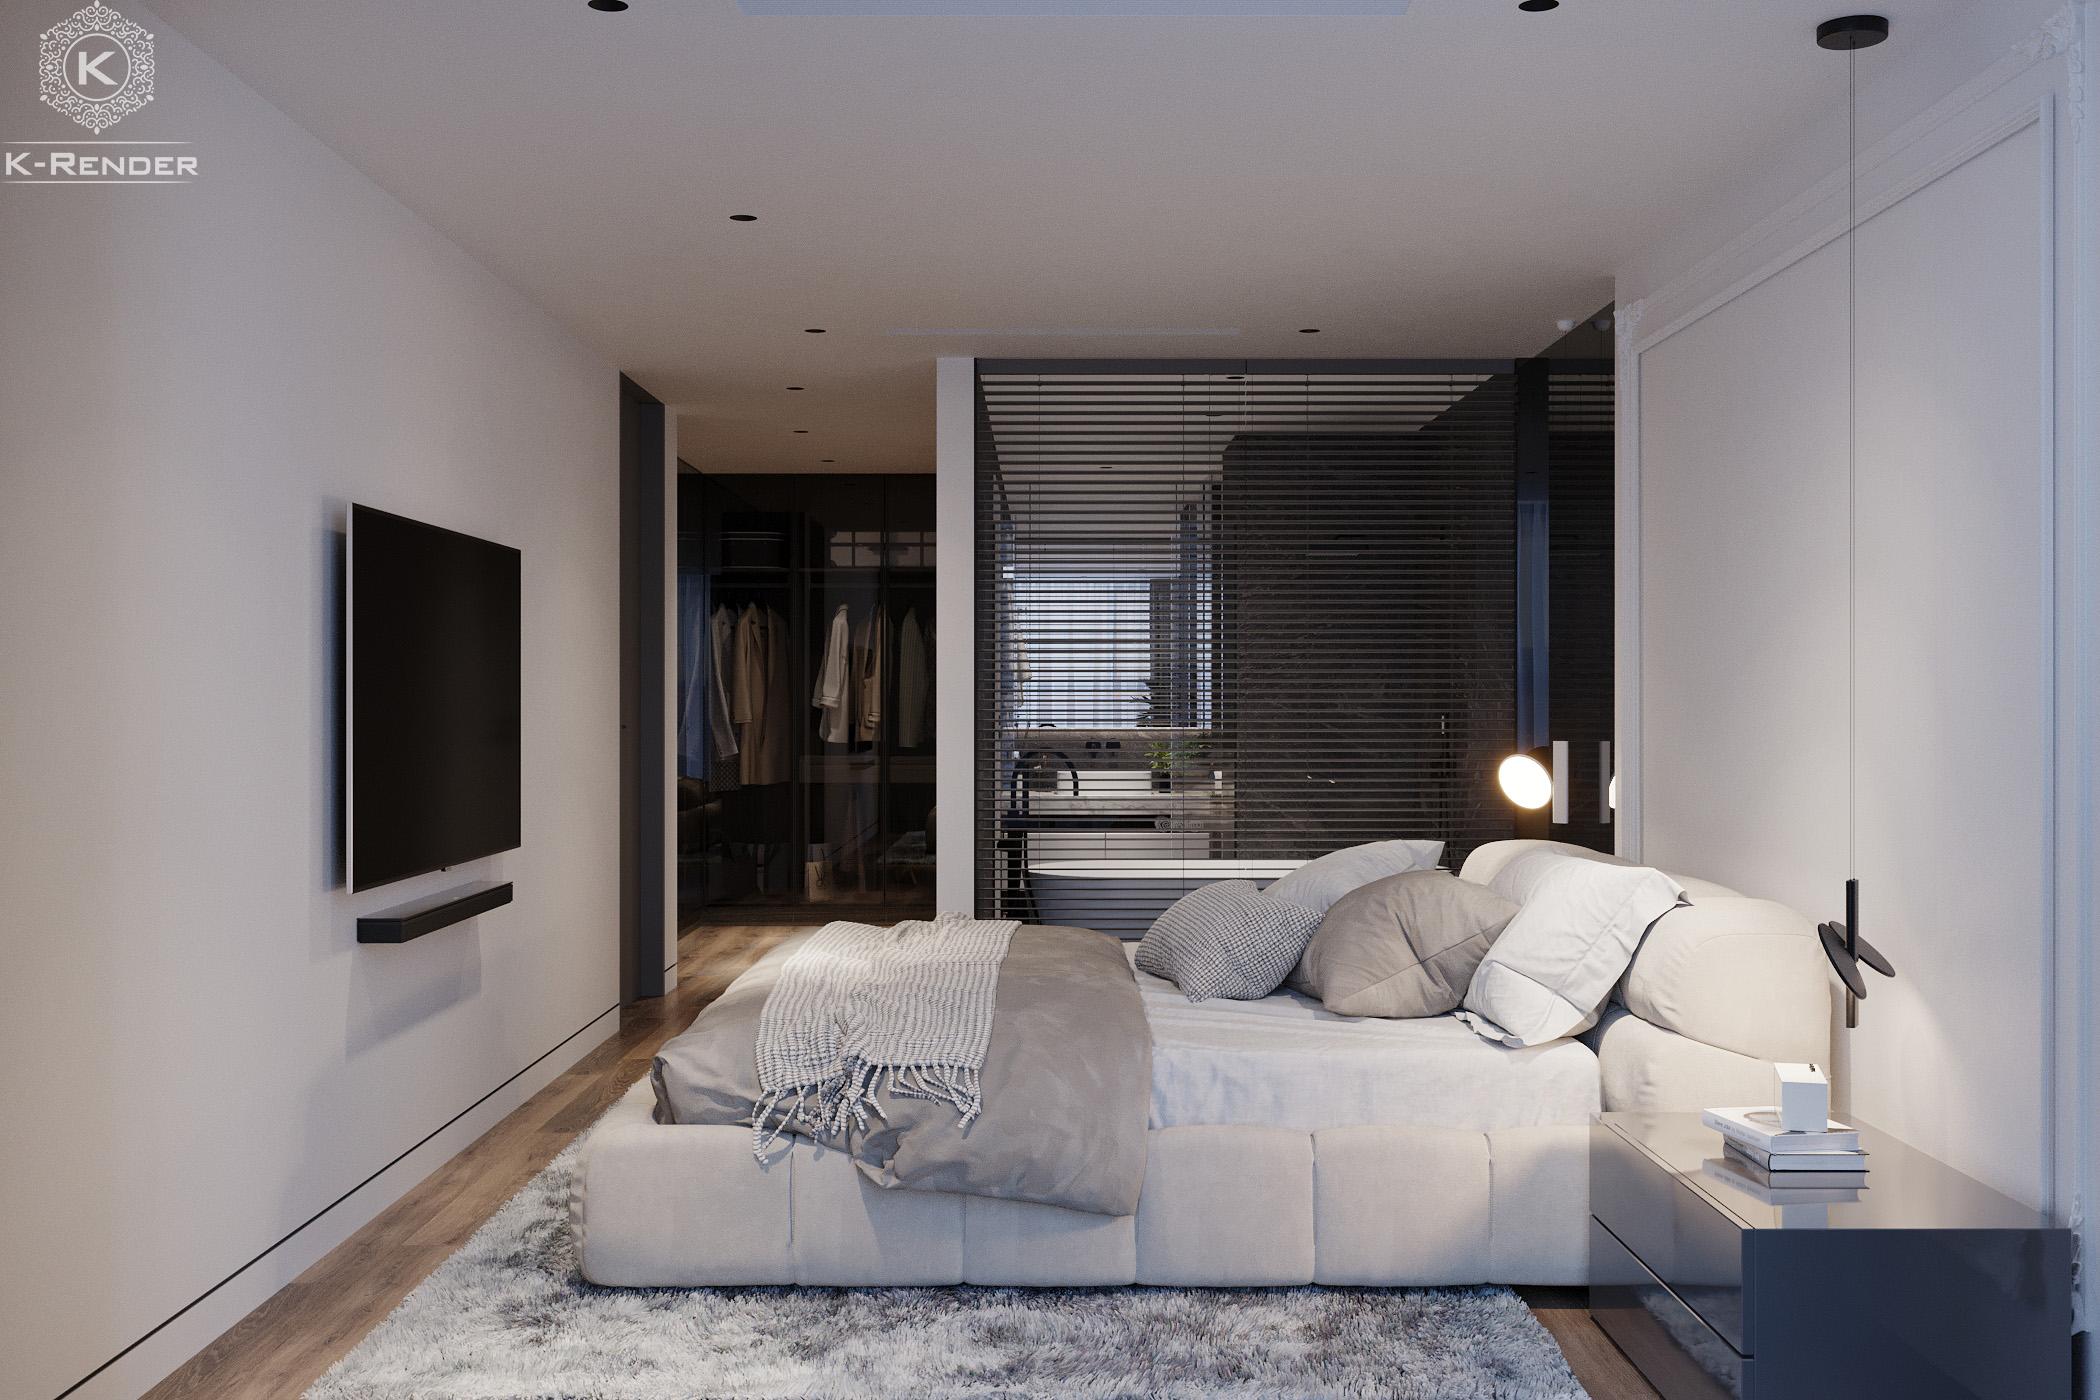 sunshine-apartment-k-render-studio-3d-rendering-studio-1